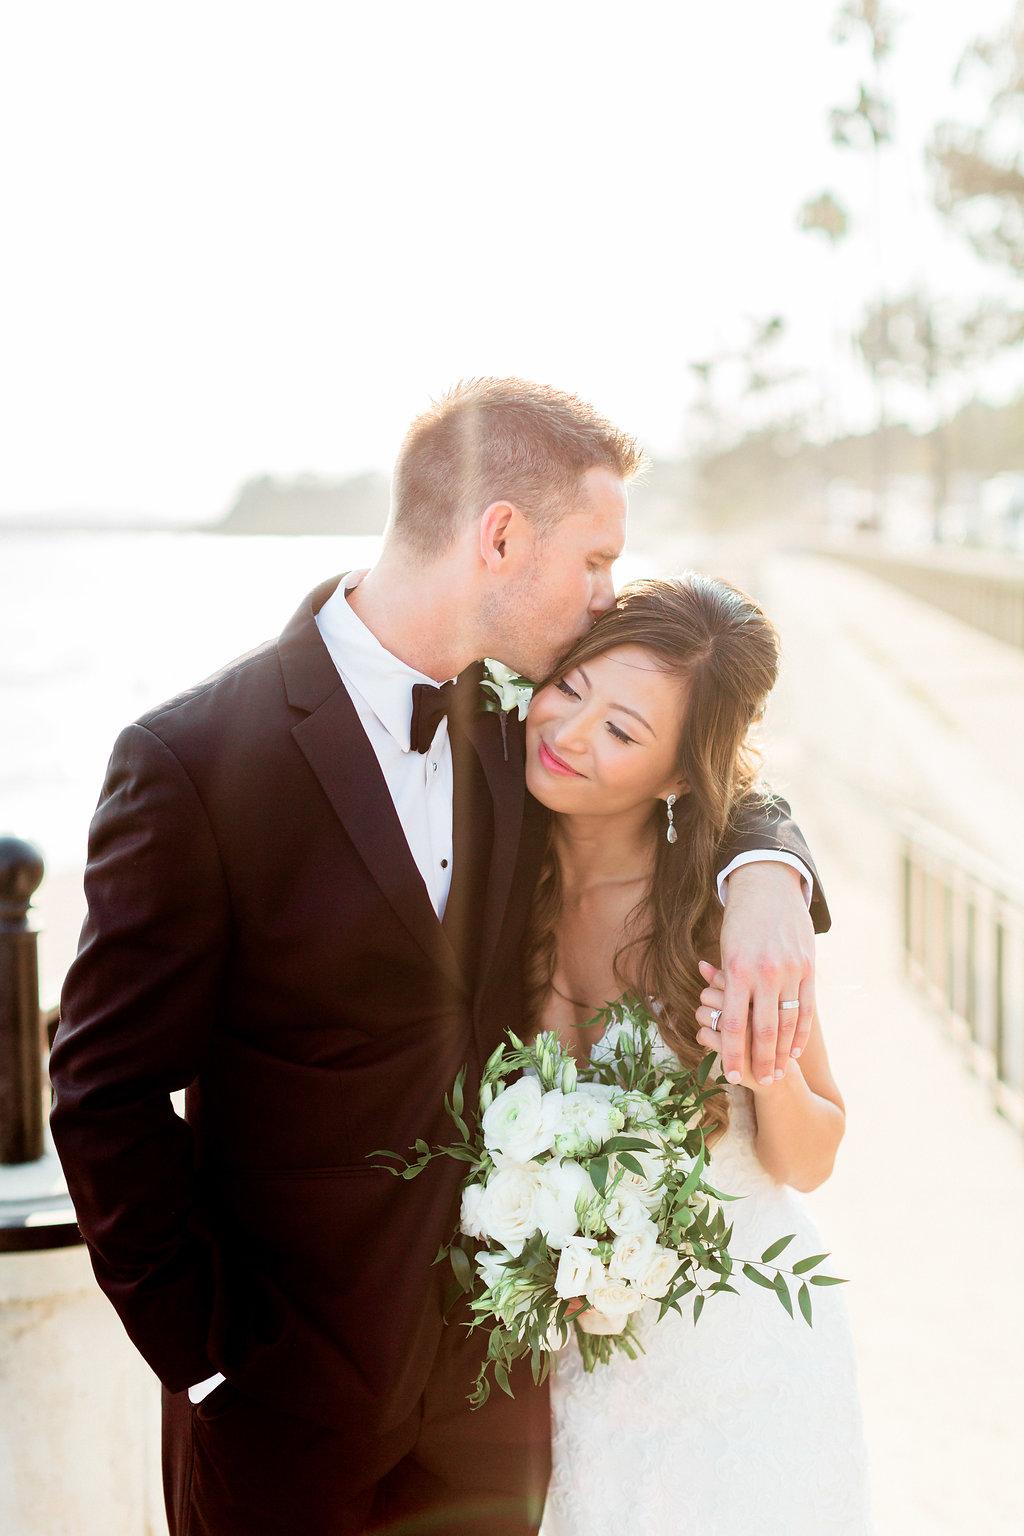 santa-barbara-elopement-elope-wedding-planner-coordinator-day-of-four-seasons-biltmore-ocean-front-view-garden-pink-white-green-montecito-black-tie (1).jpg